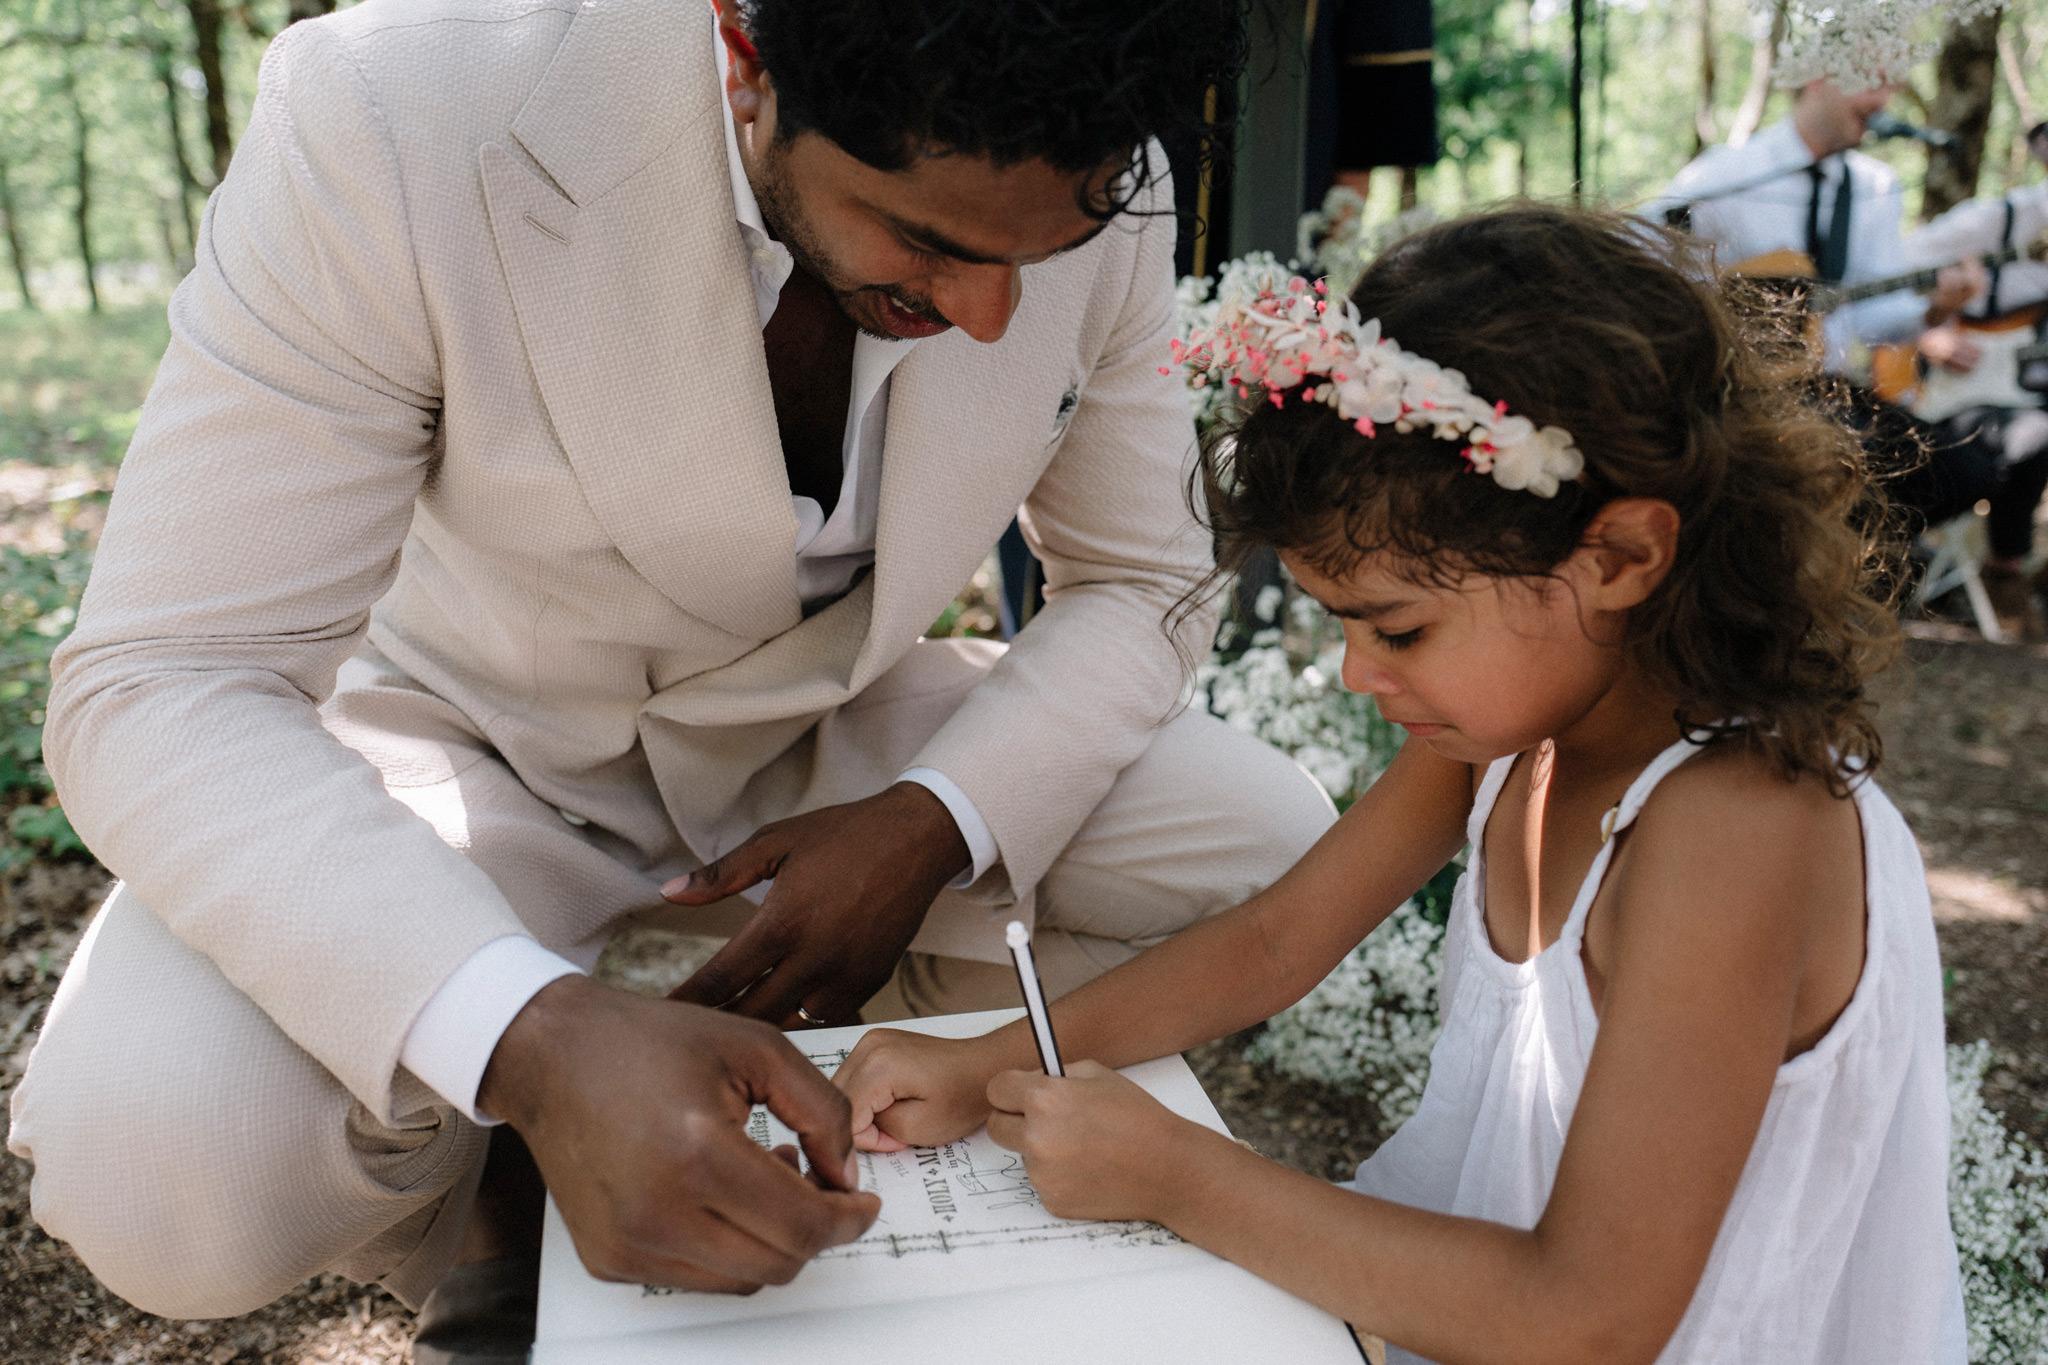 ceremonie-marie-engagement-enfant-naturel